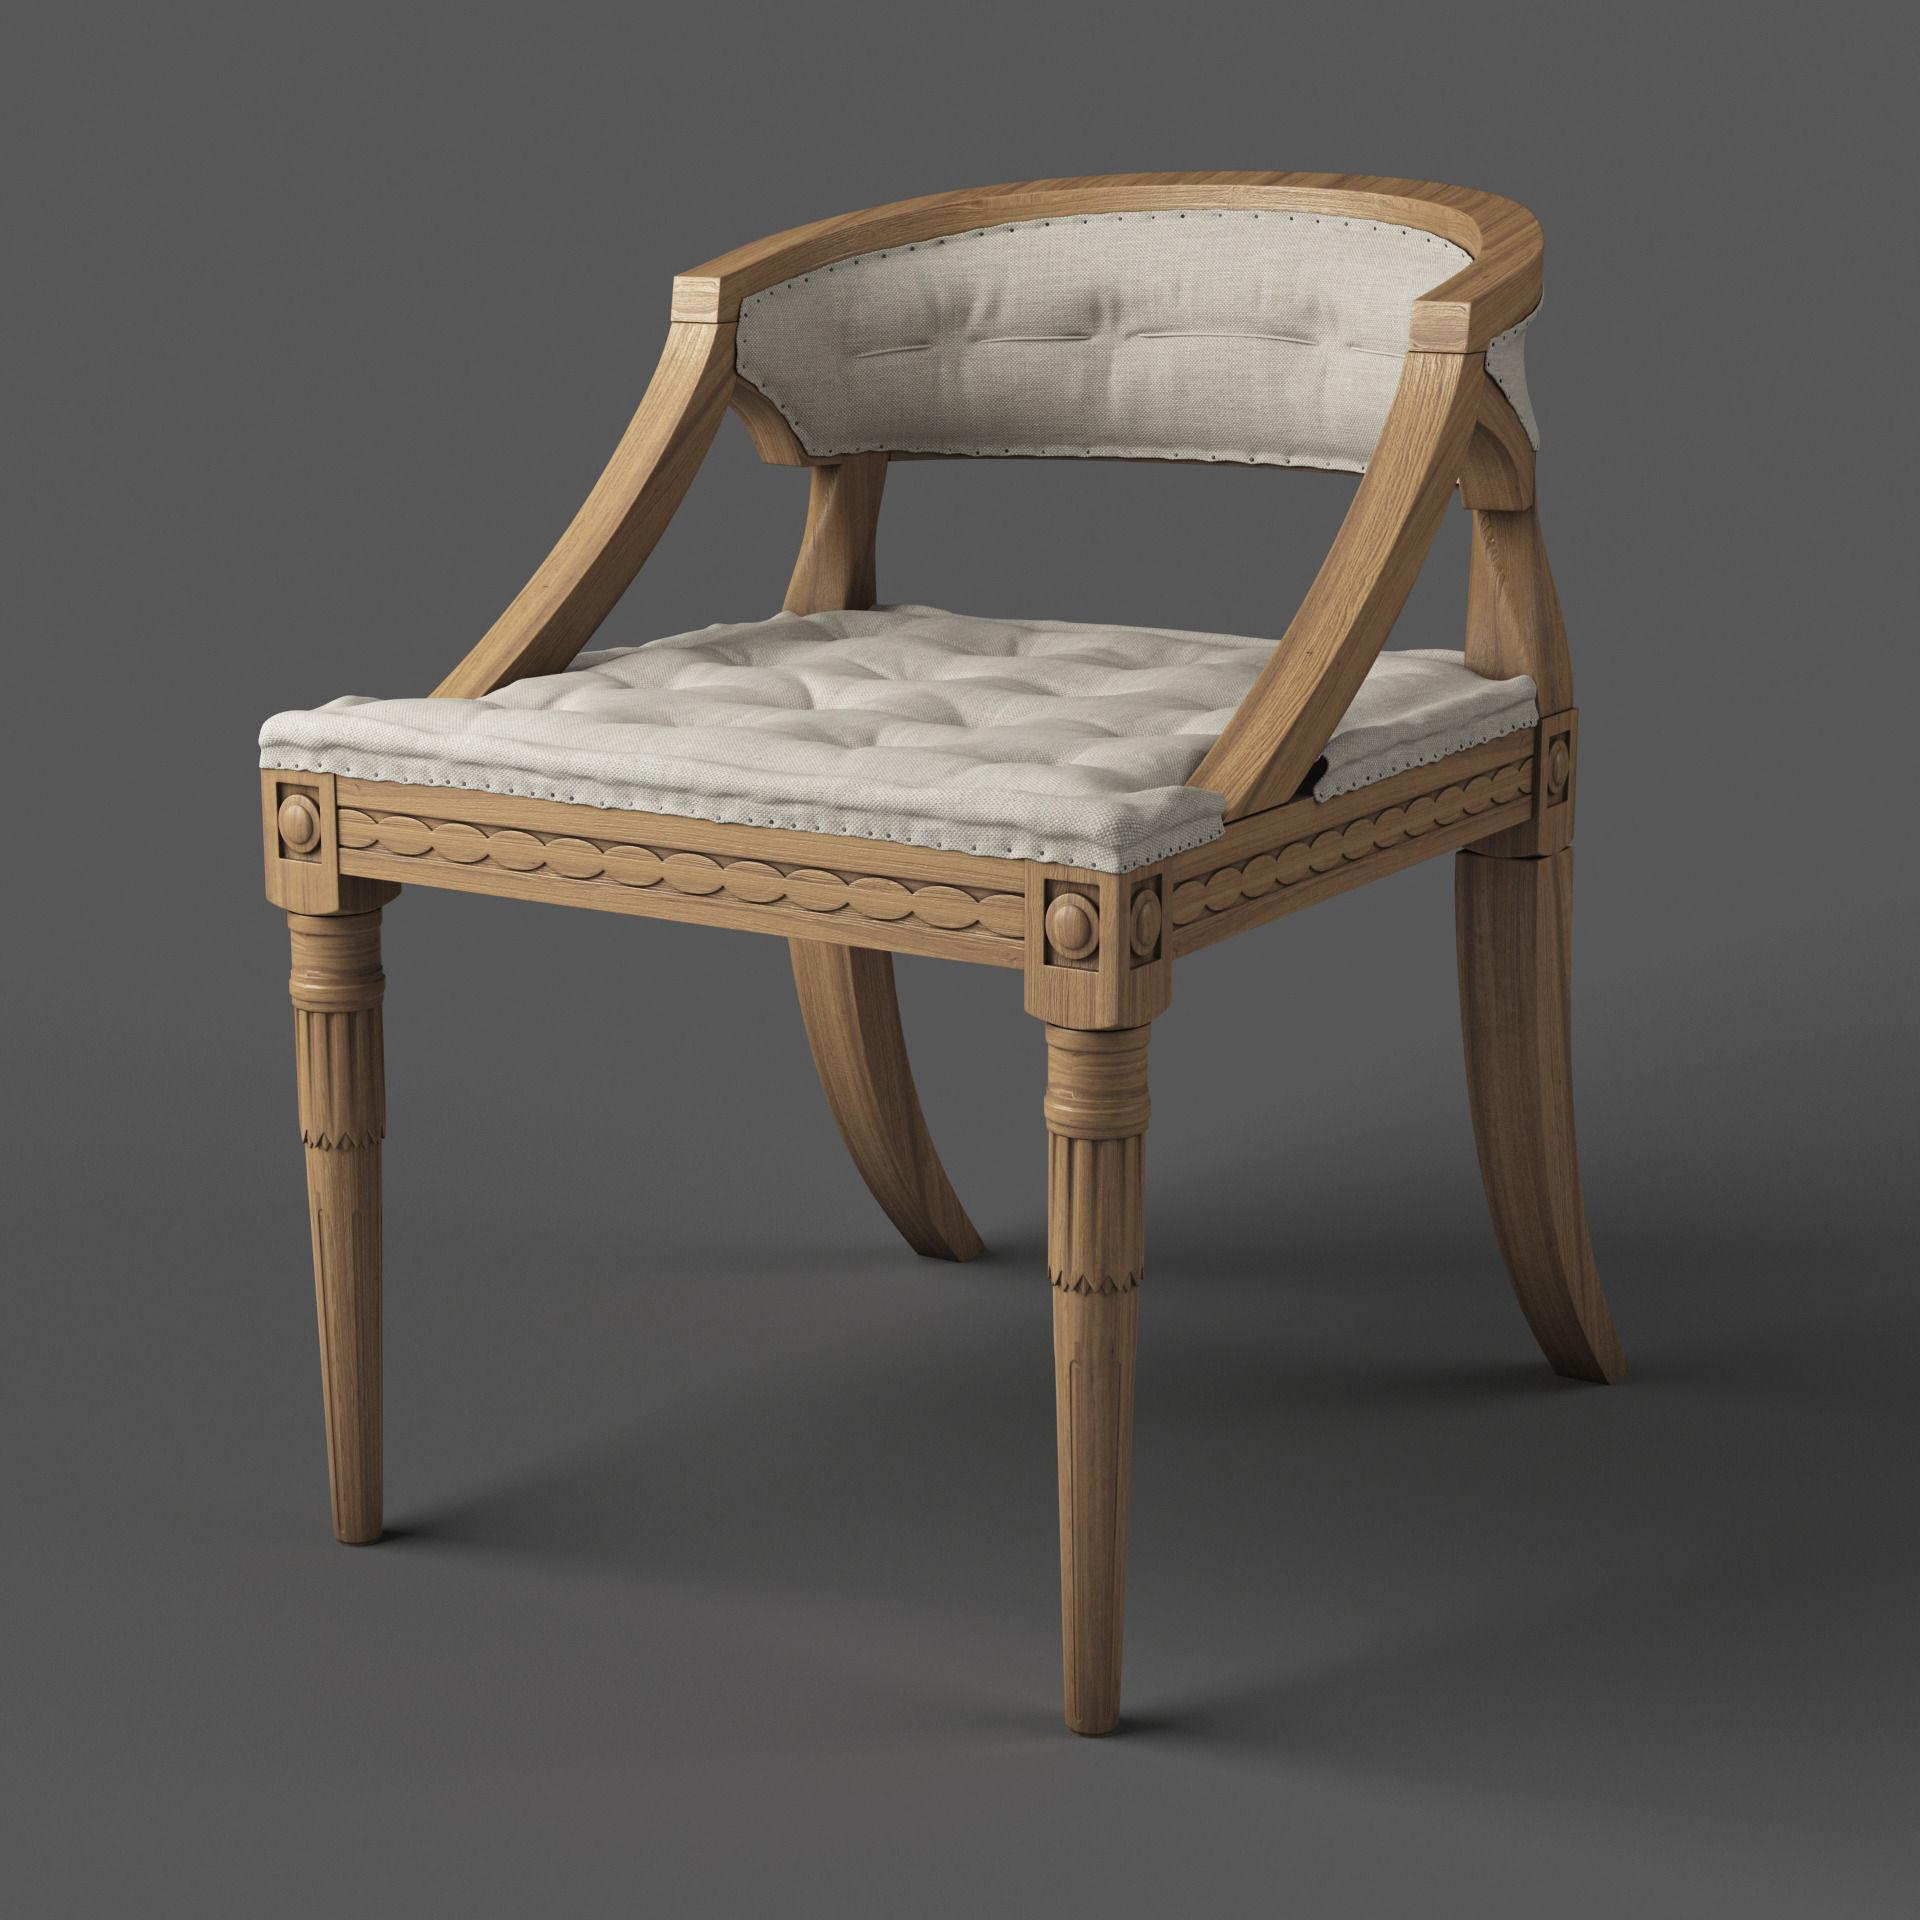 Classic Swedish Chair 3d Model Max Fbx 1 ...